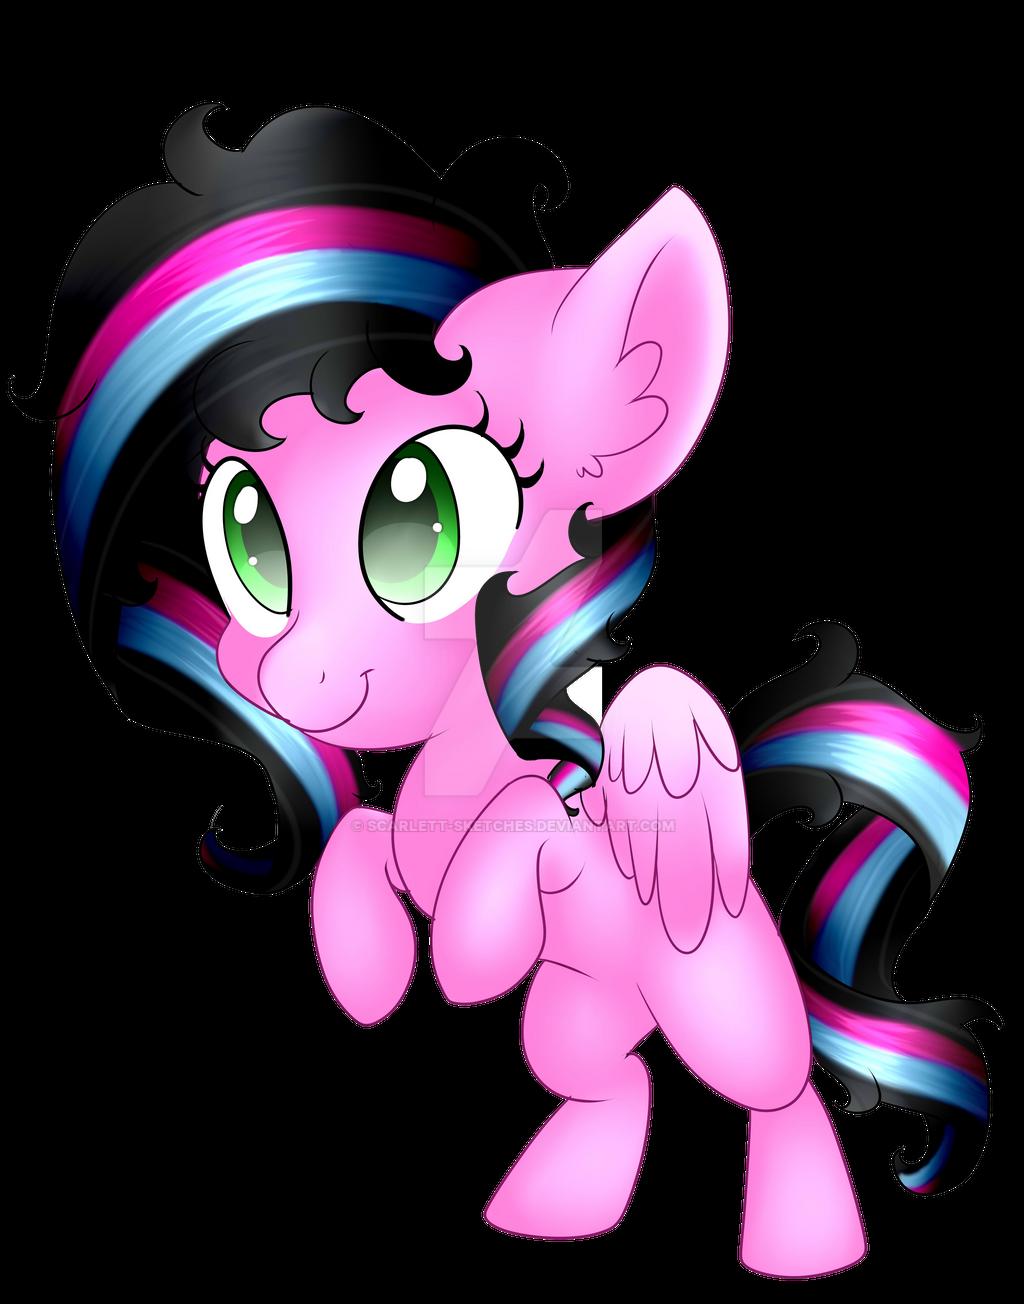 Adoptable pony #11 [CLOSED]